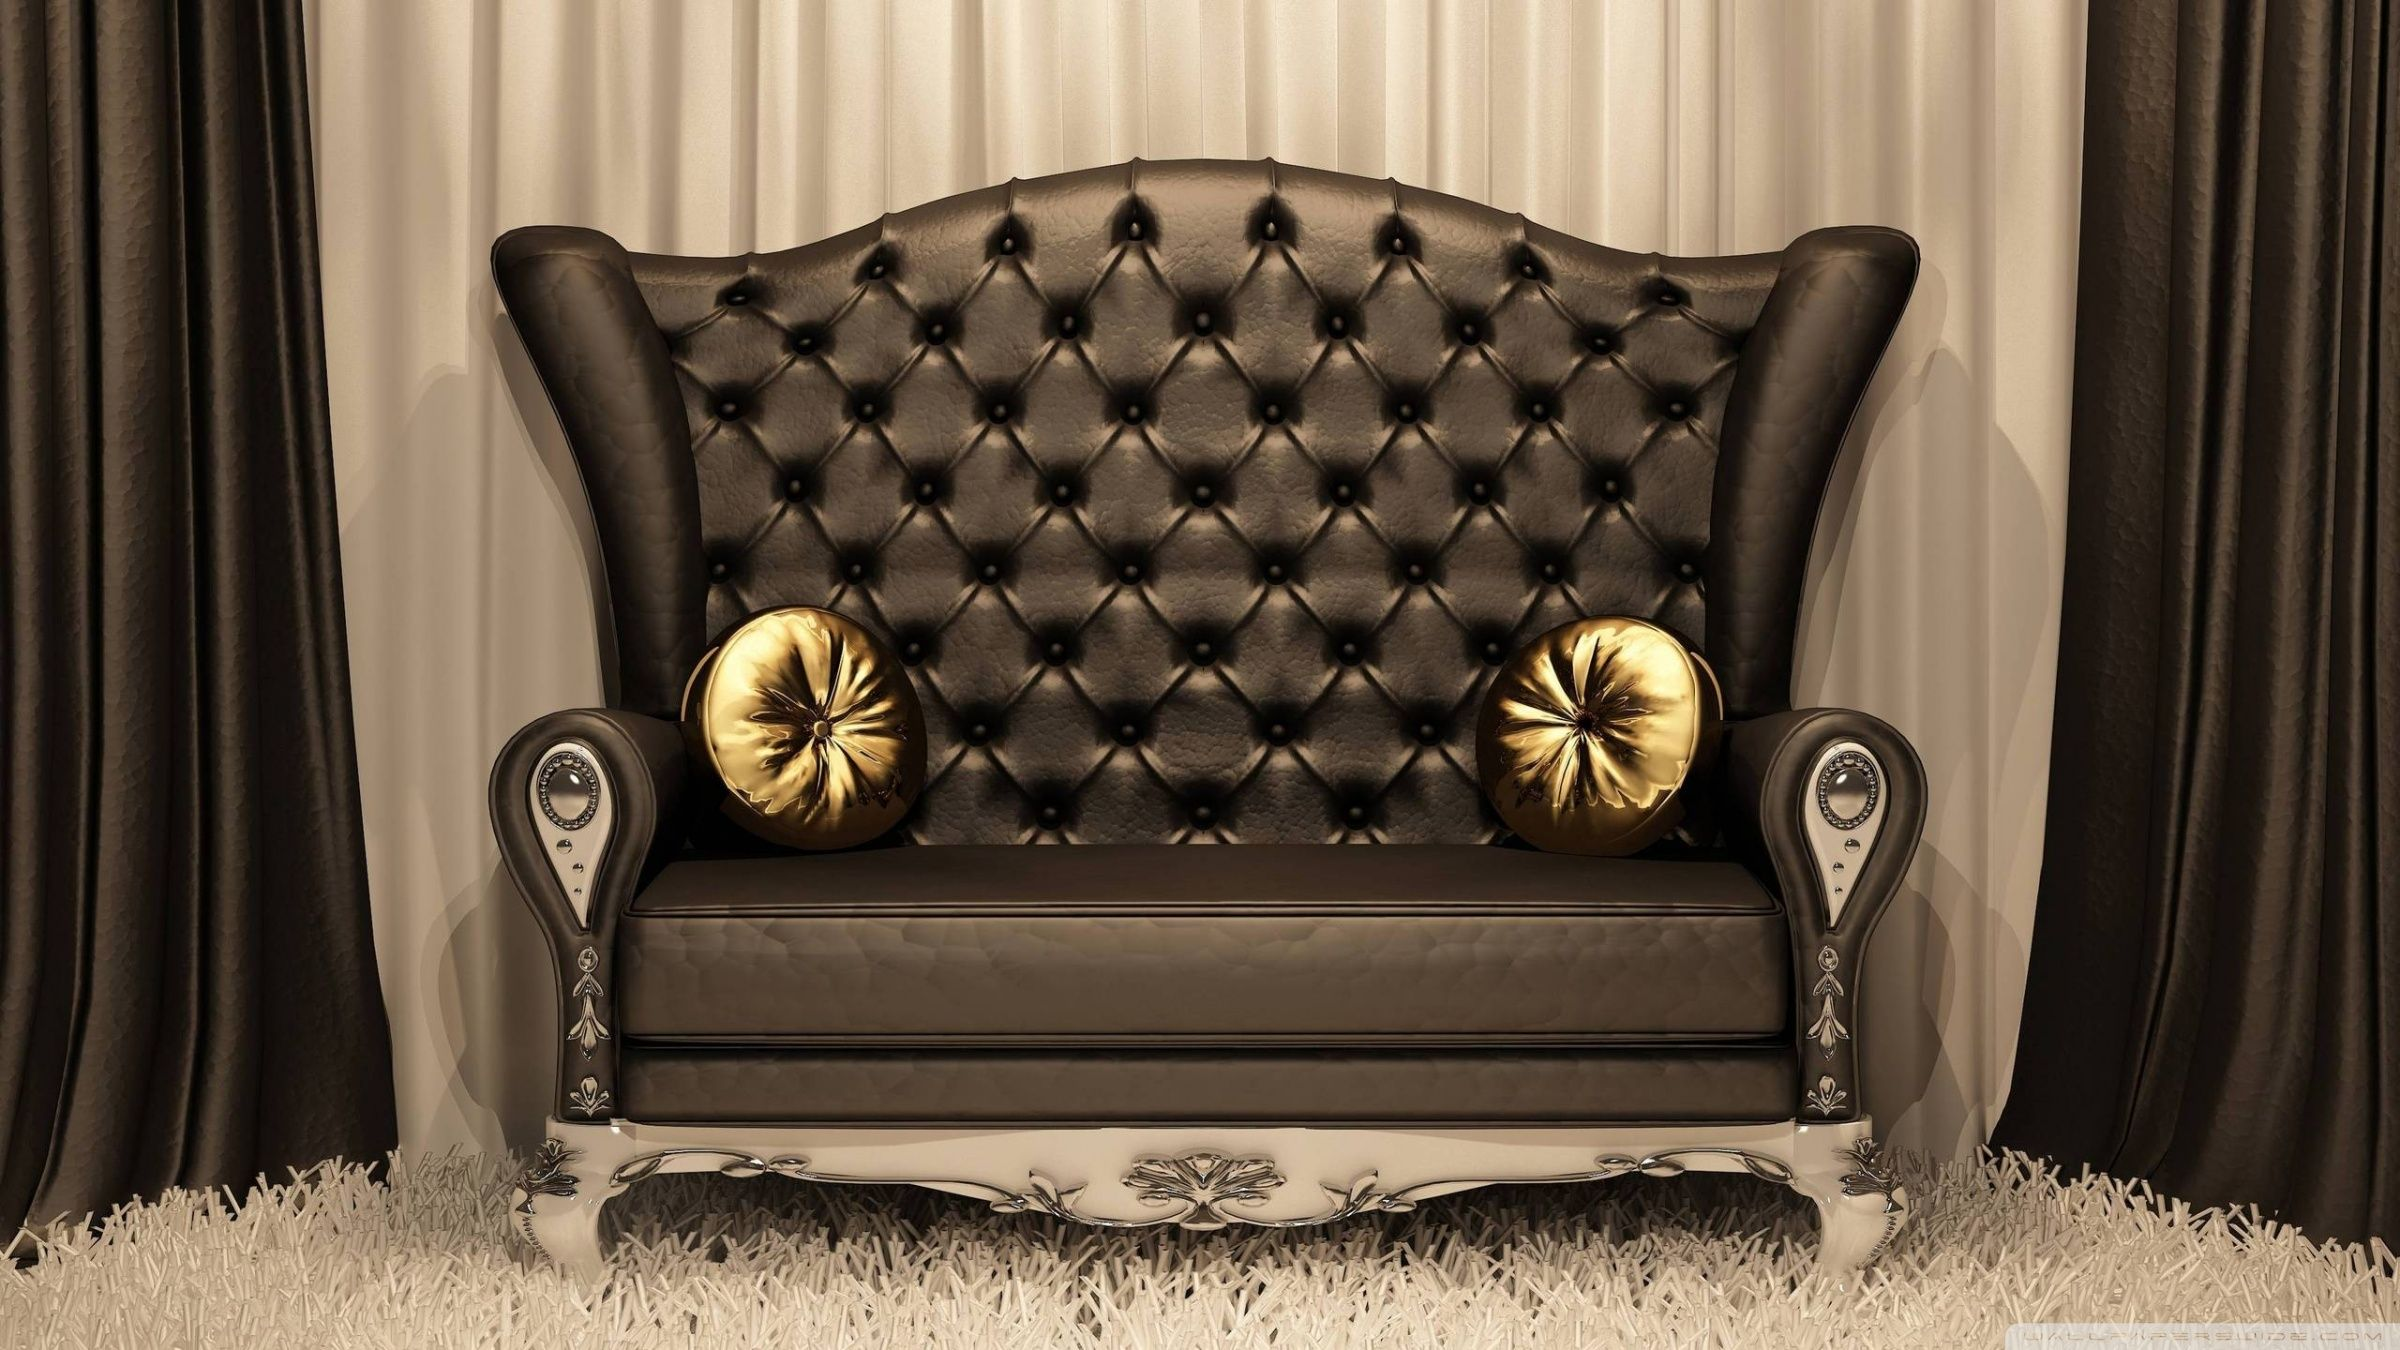 Classic Black Sofa HD desktop wallpaper High Definition